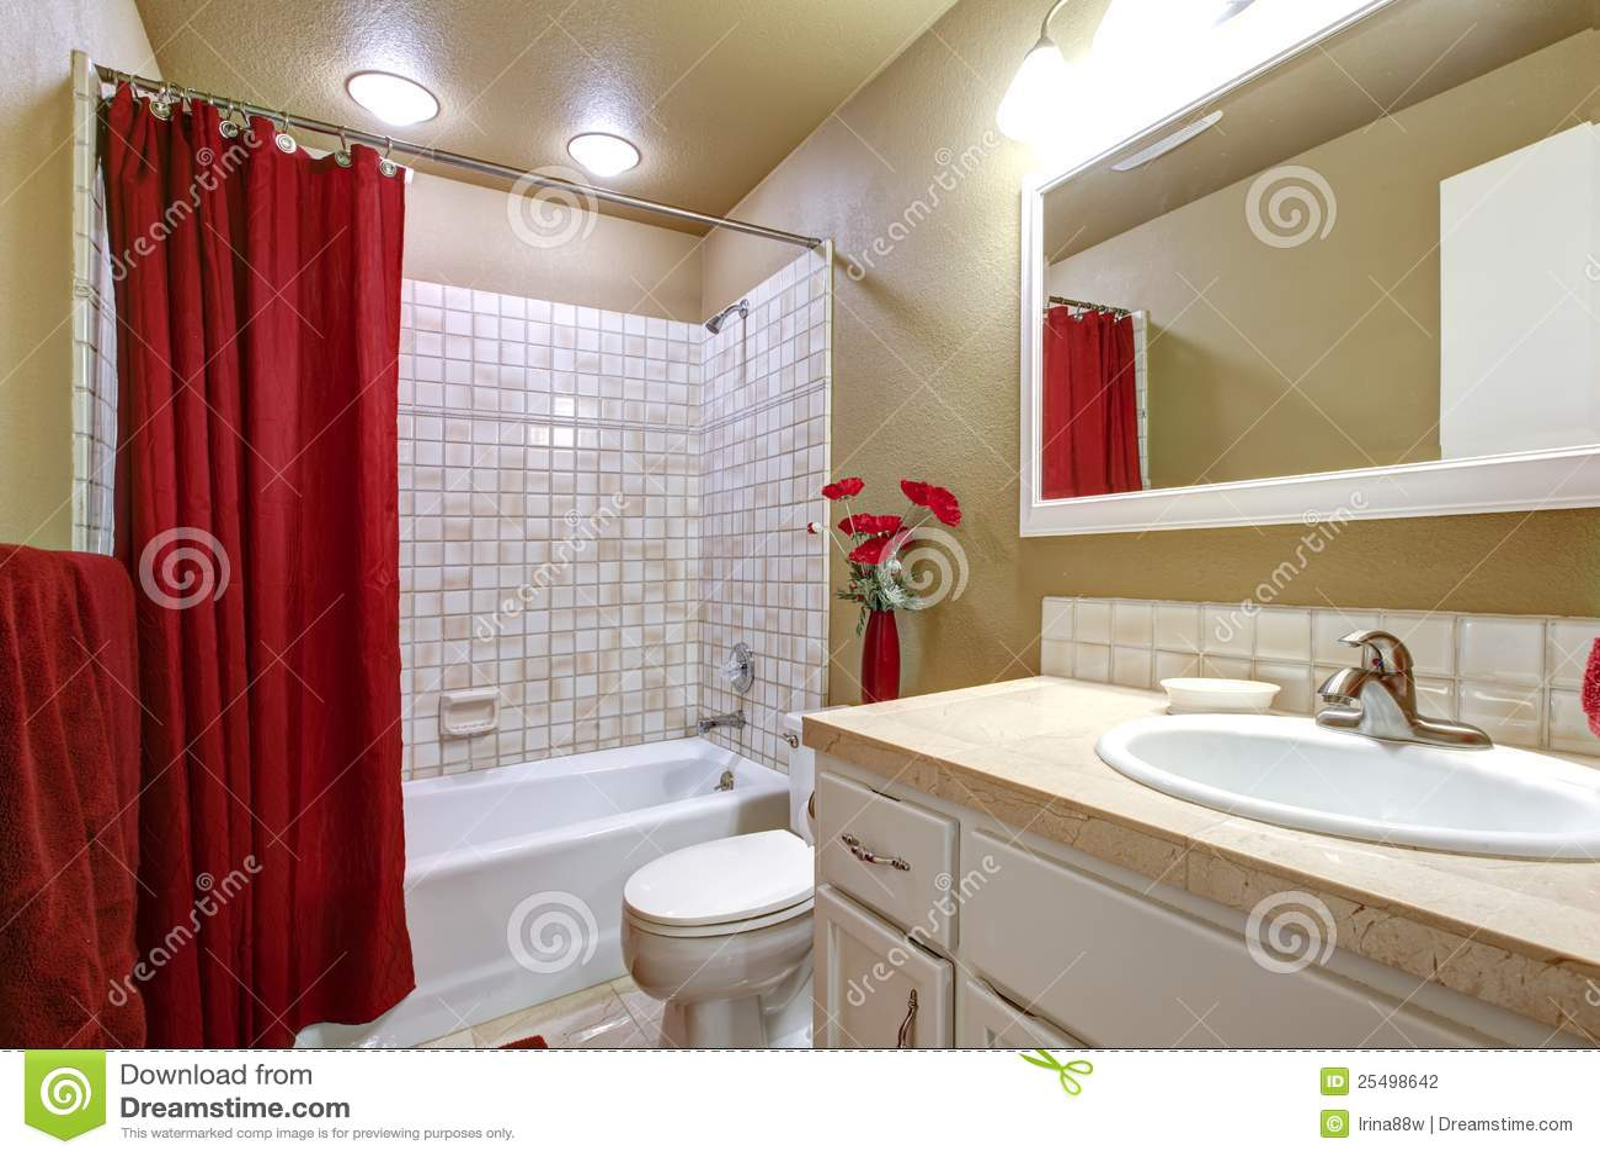 emejing salle de bain rouge et beige photos - awesome interior ... - Salle De Bain Rouge Et Beige